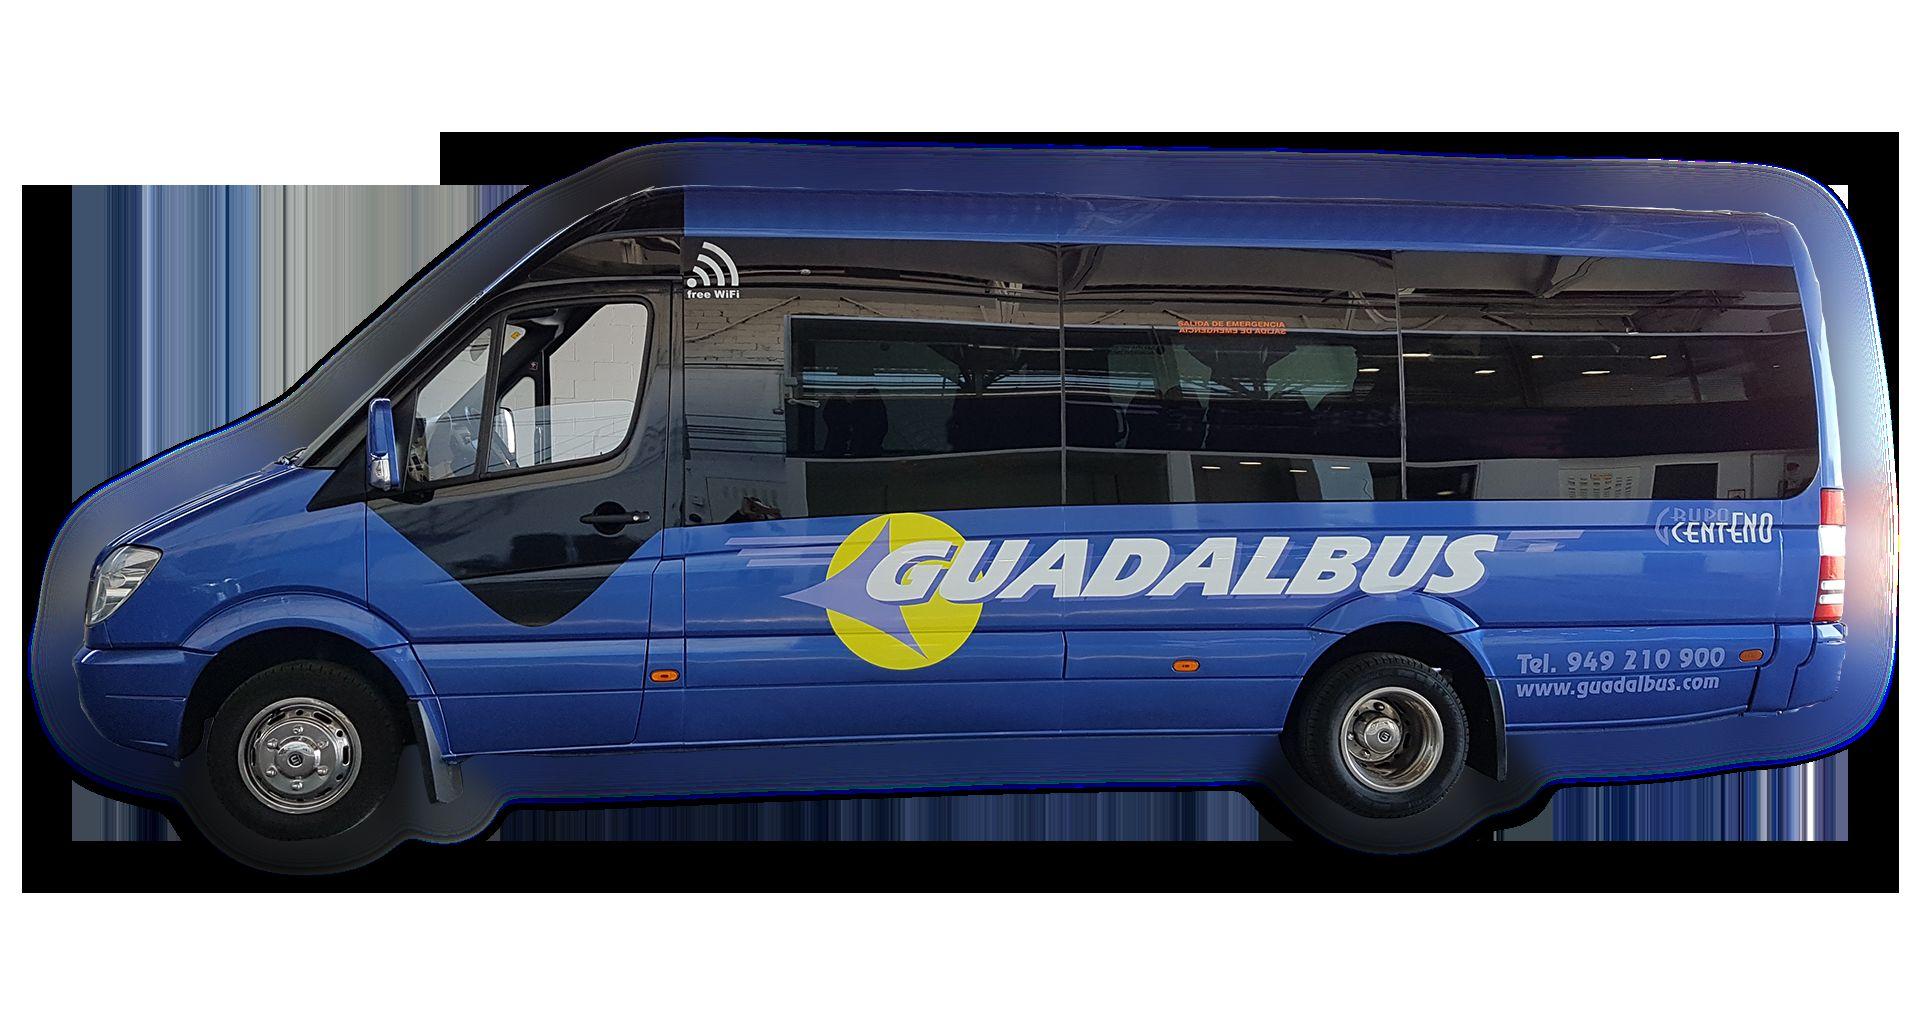 Foto 7 de Autocares en Guadalajara | Guadalbus